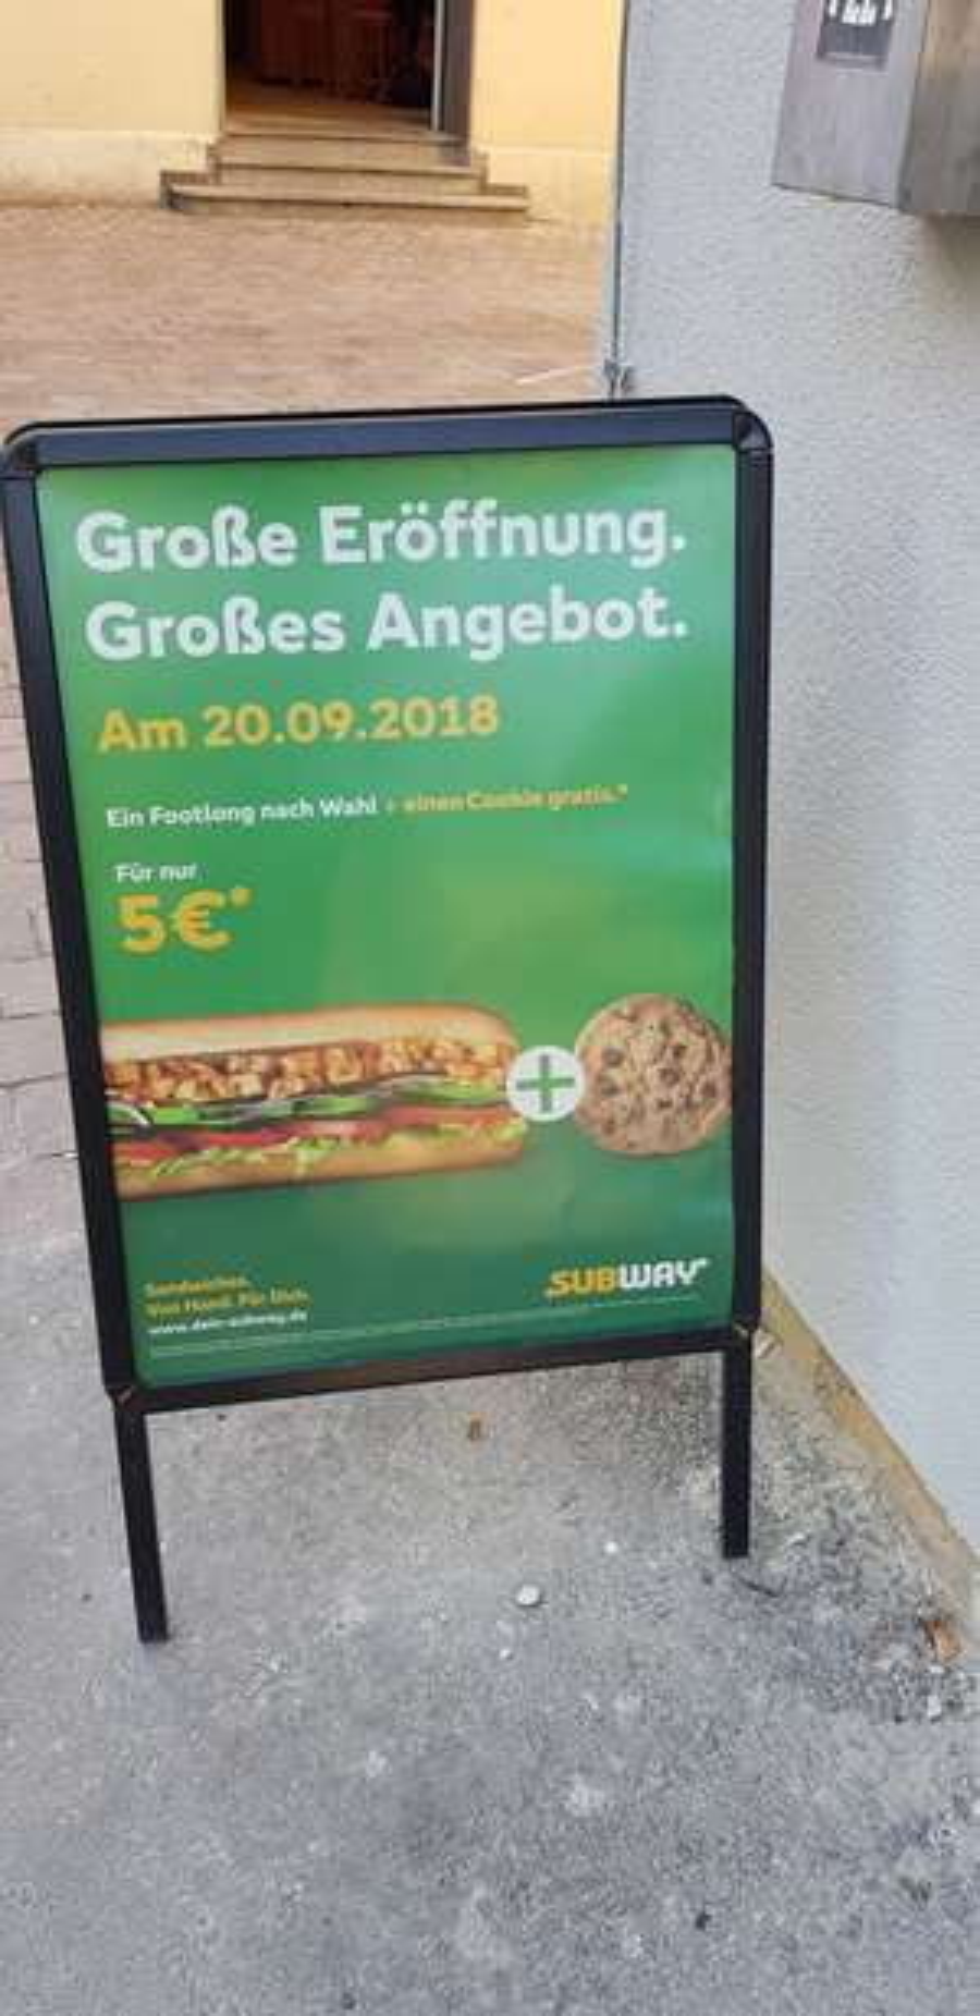 [LOKAL] Augsburg Subway am Bahnhof alle footlong Subs für 5€ + gratis Cookie